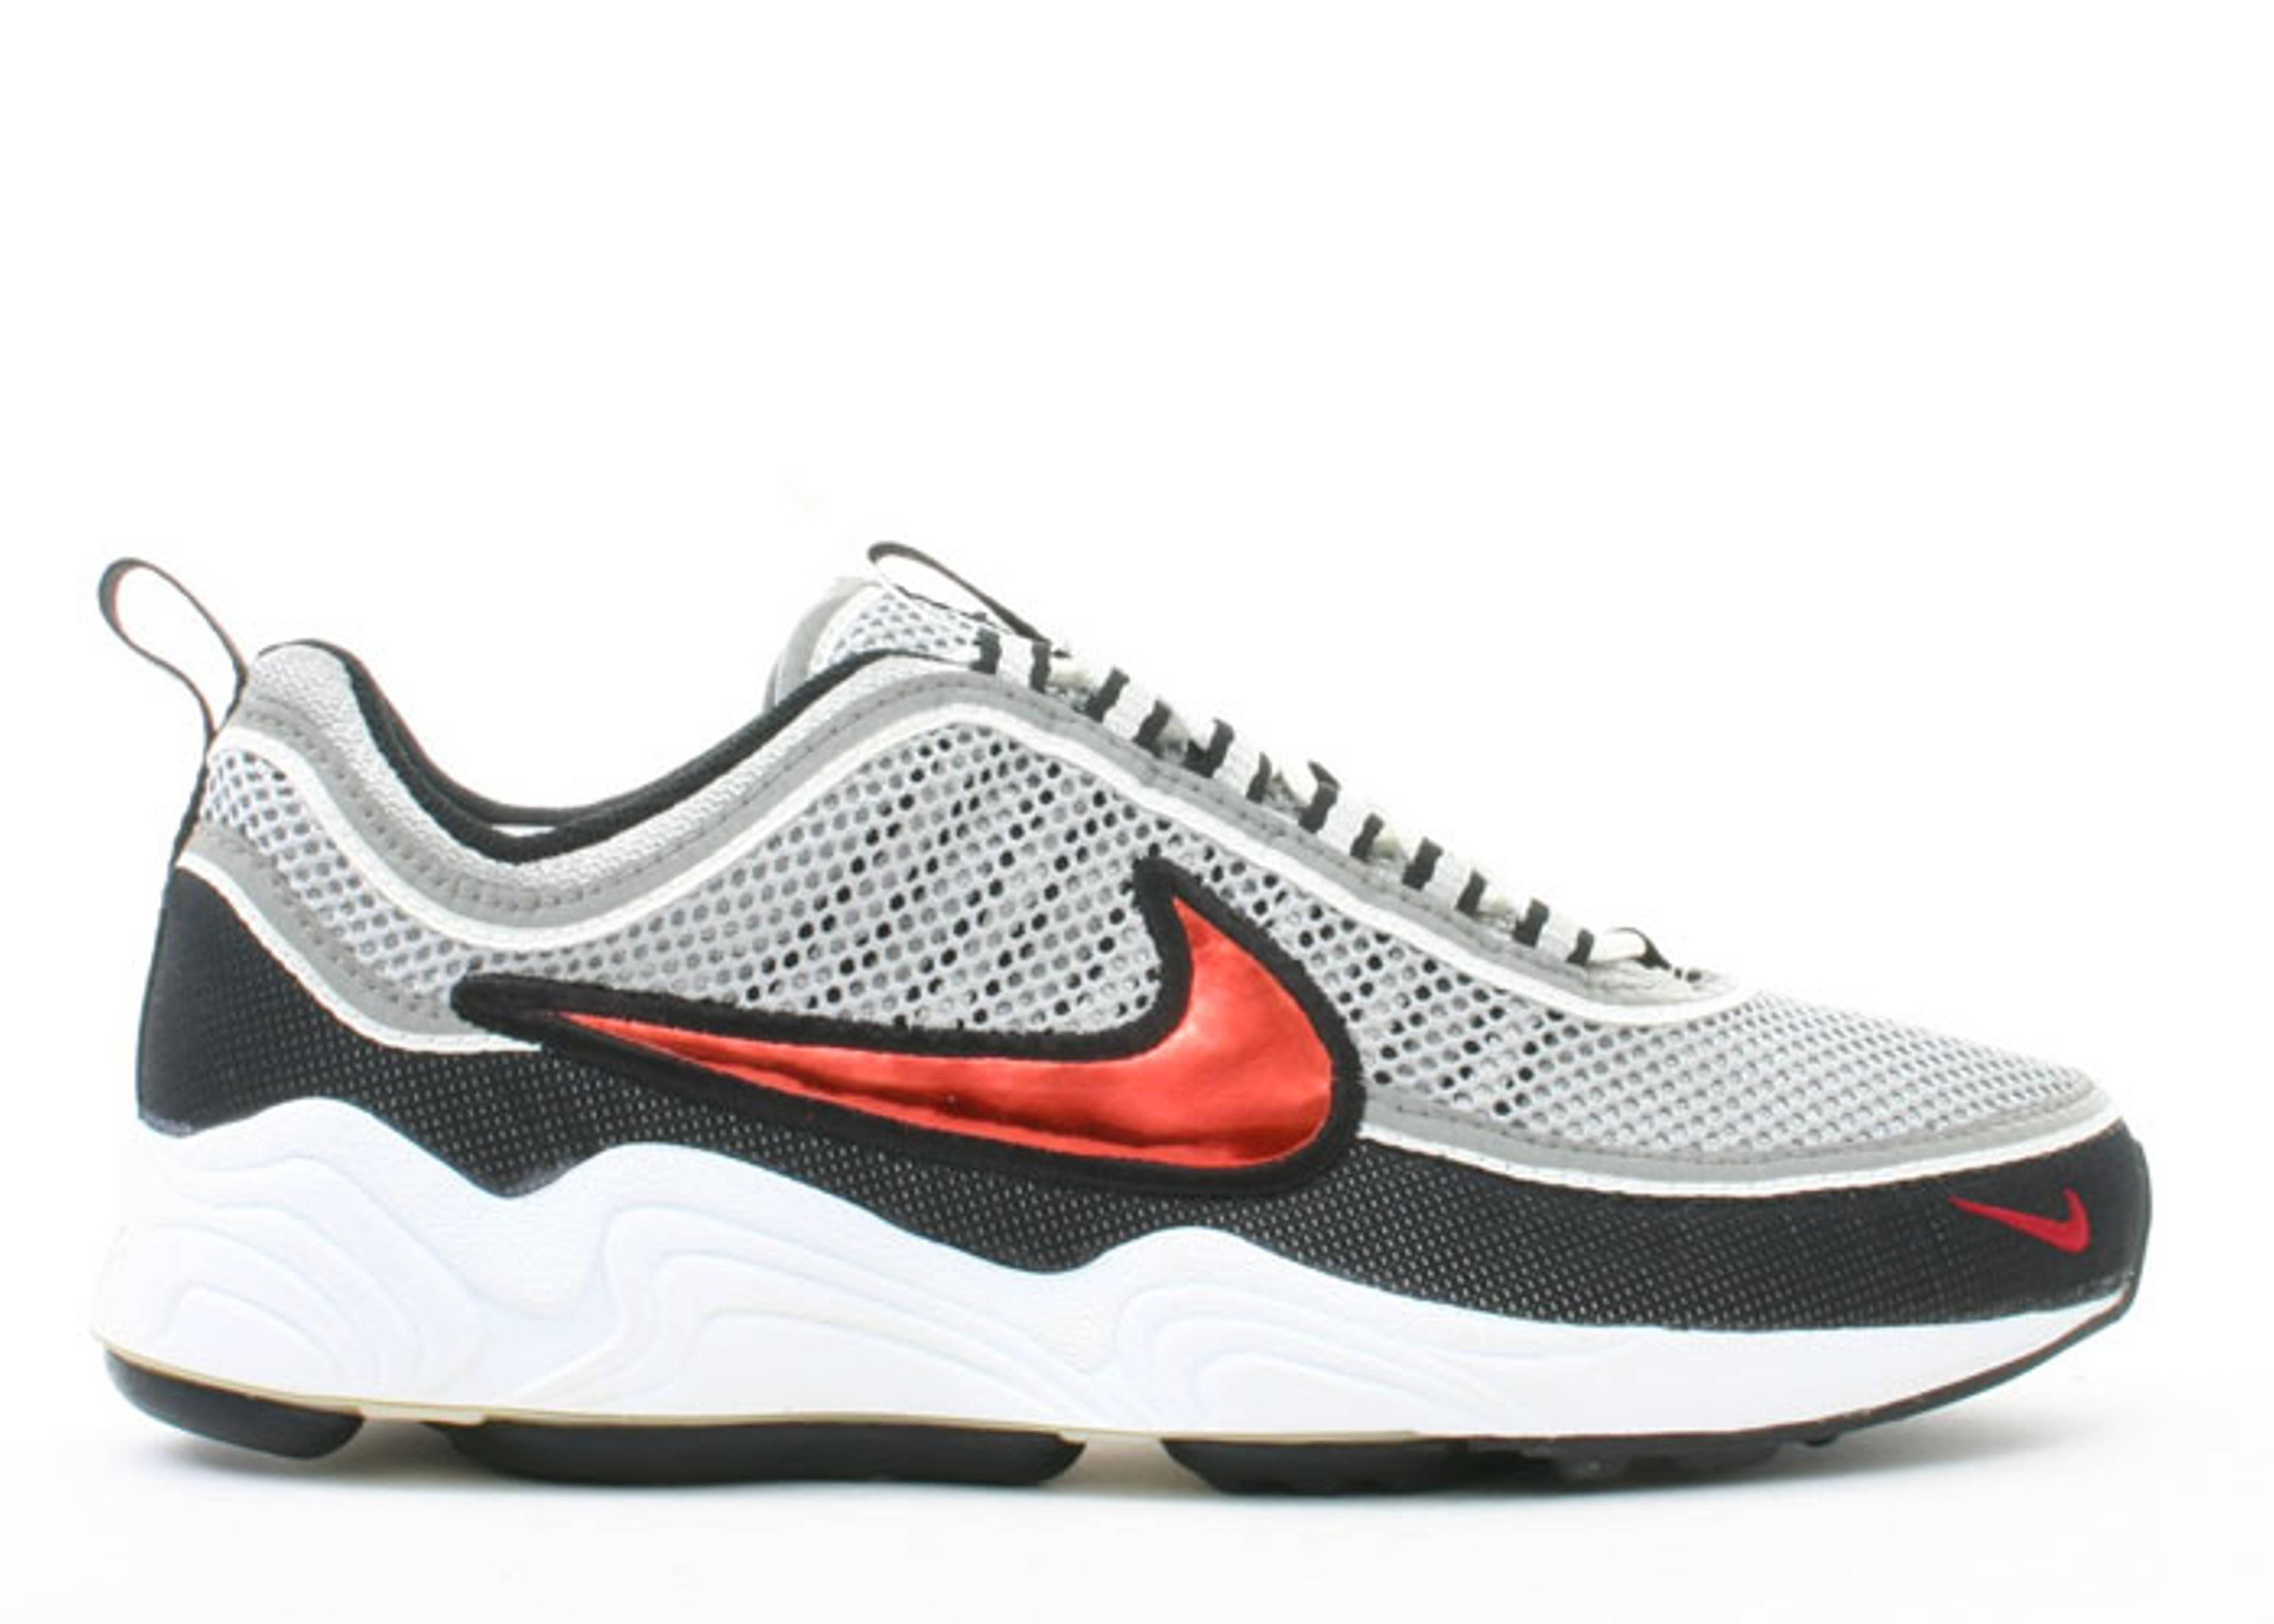 code promo 7c526 ace20 Air Zoom Spiridon (og) - Nike - 104082 001 - metallic silver ...